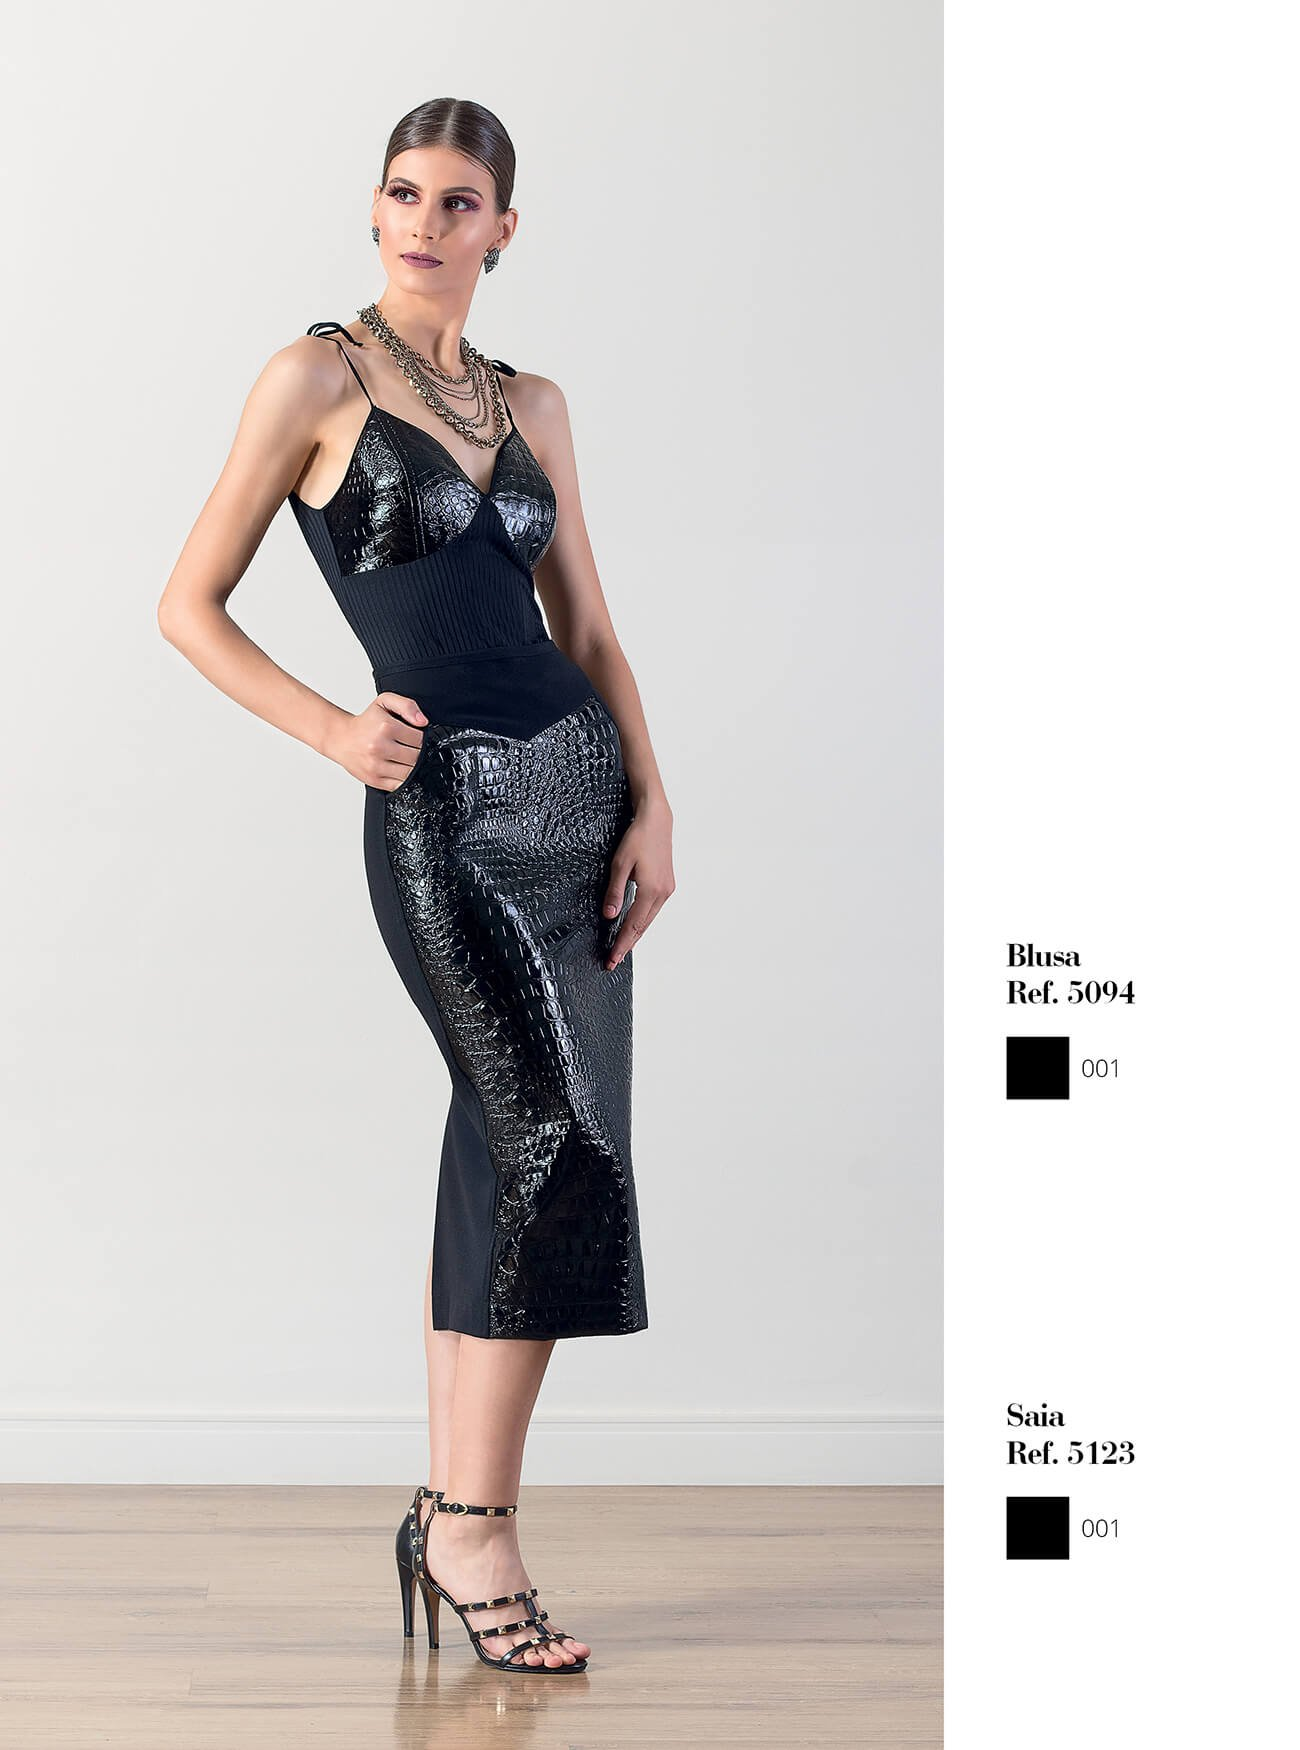 Blusa estilo corselet crocodilo couro fake | Saia lápis crocodilo couro fake